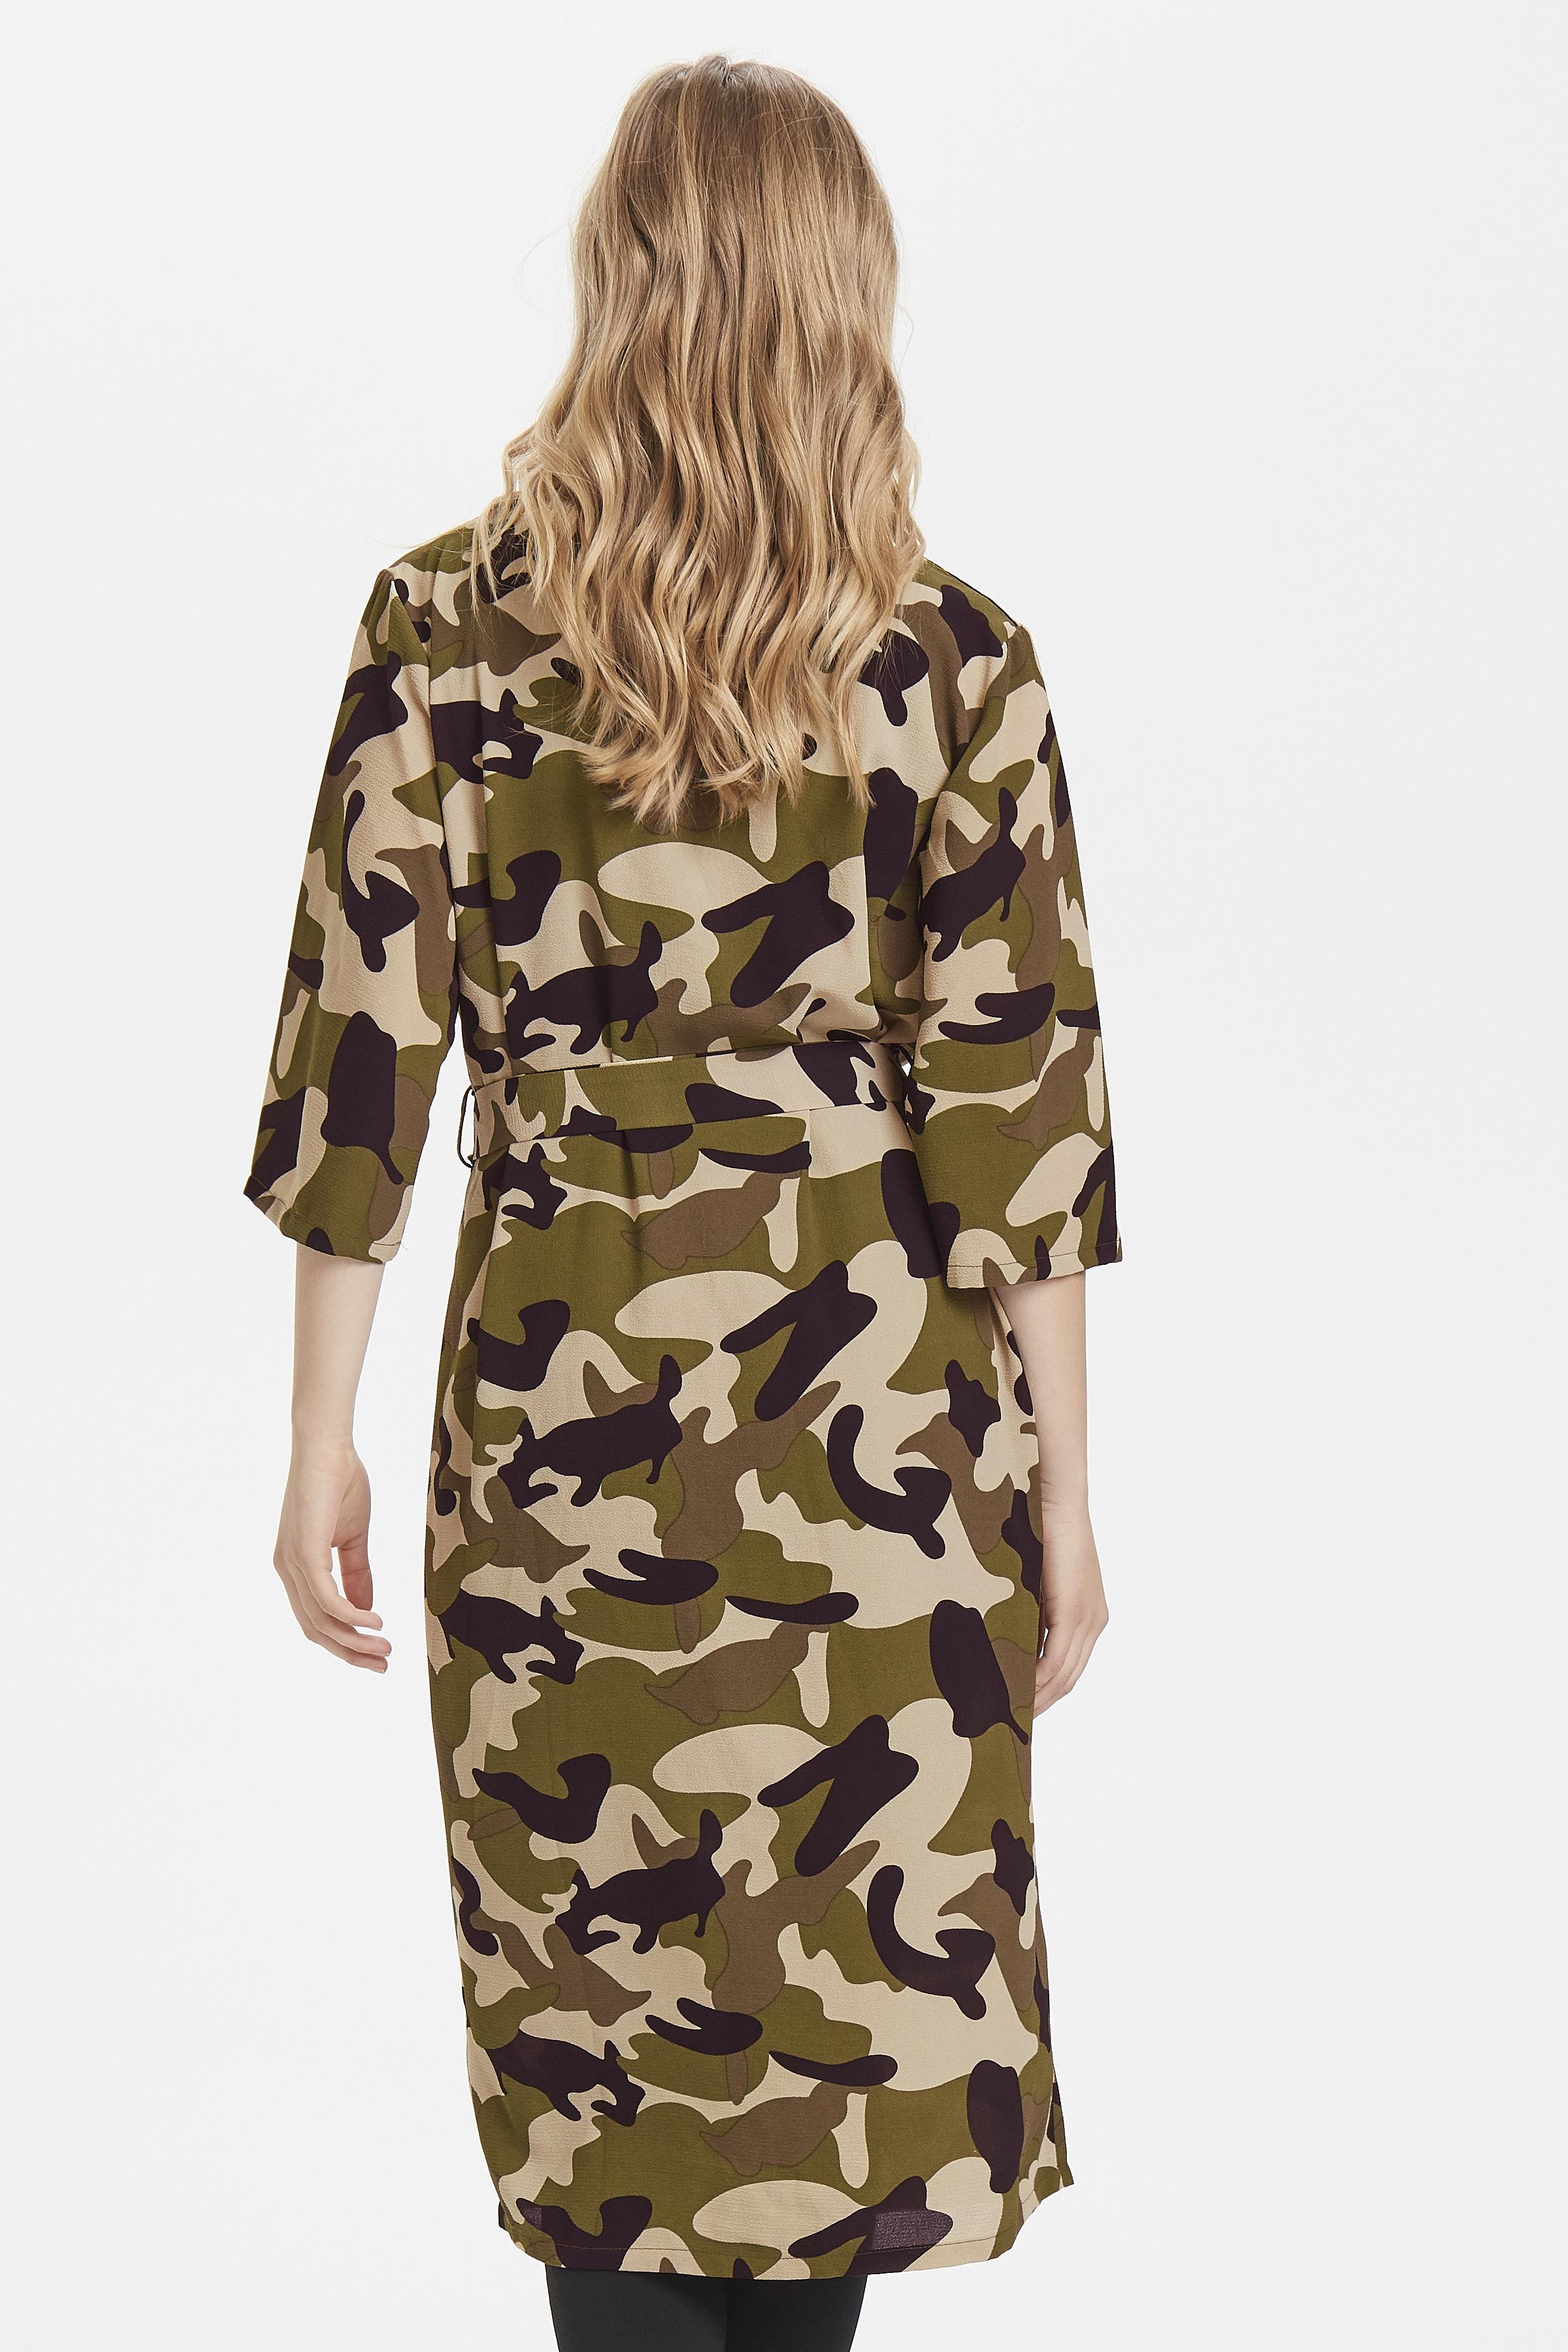 Camo combi 1 Kimono von b.young – Kaufen Sie Camo combi 1 Kimono aus Größe 34-42 hier